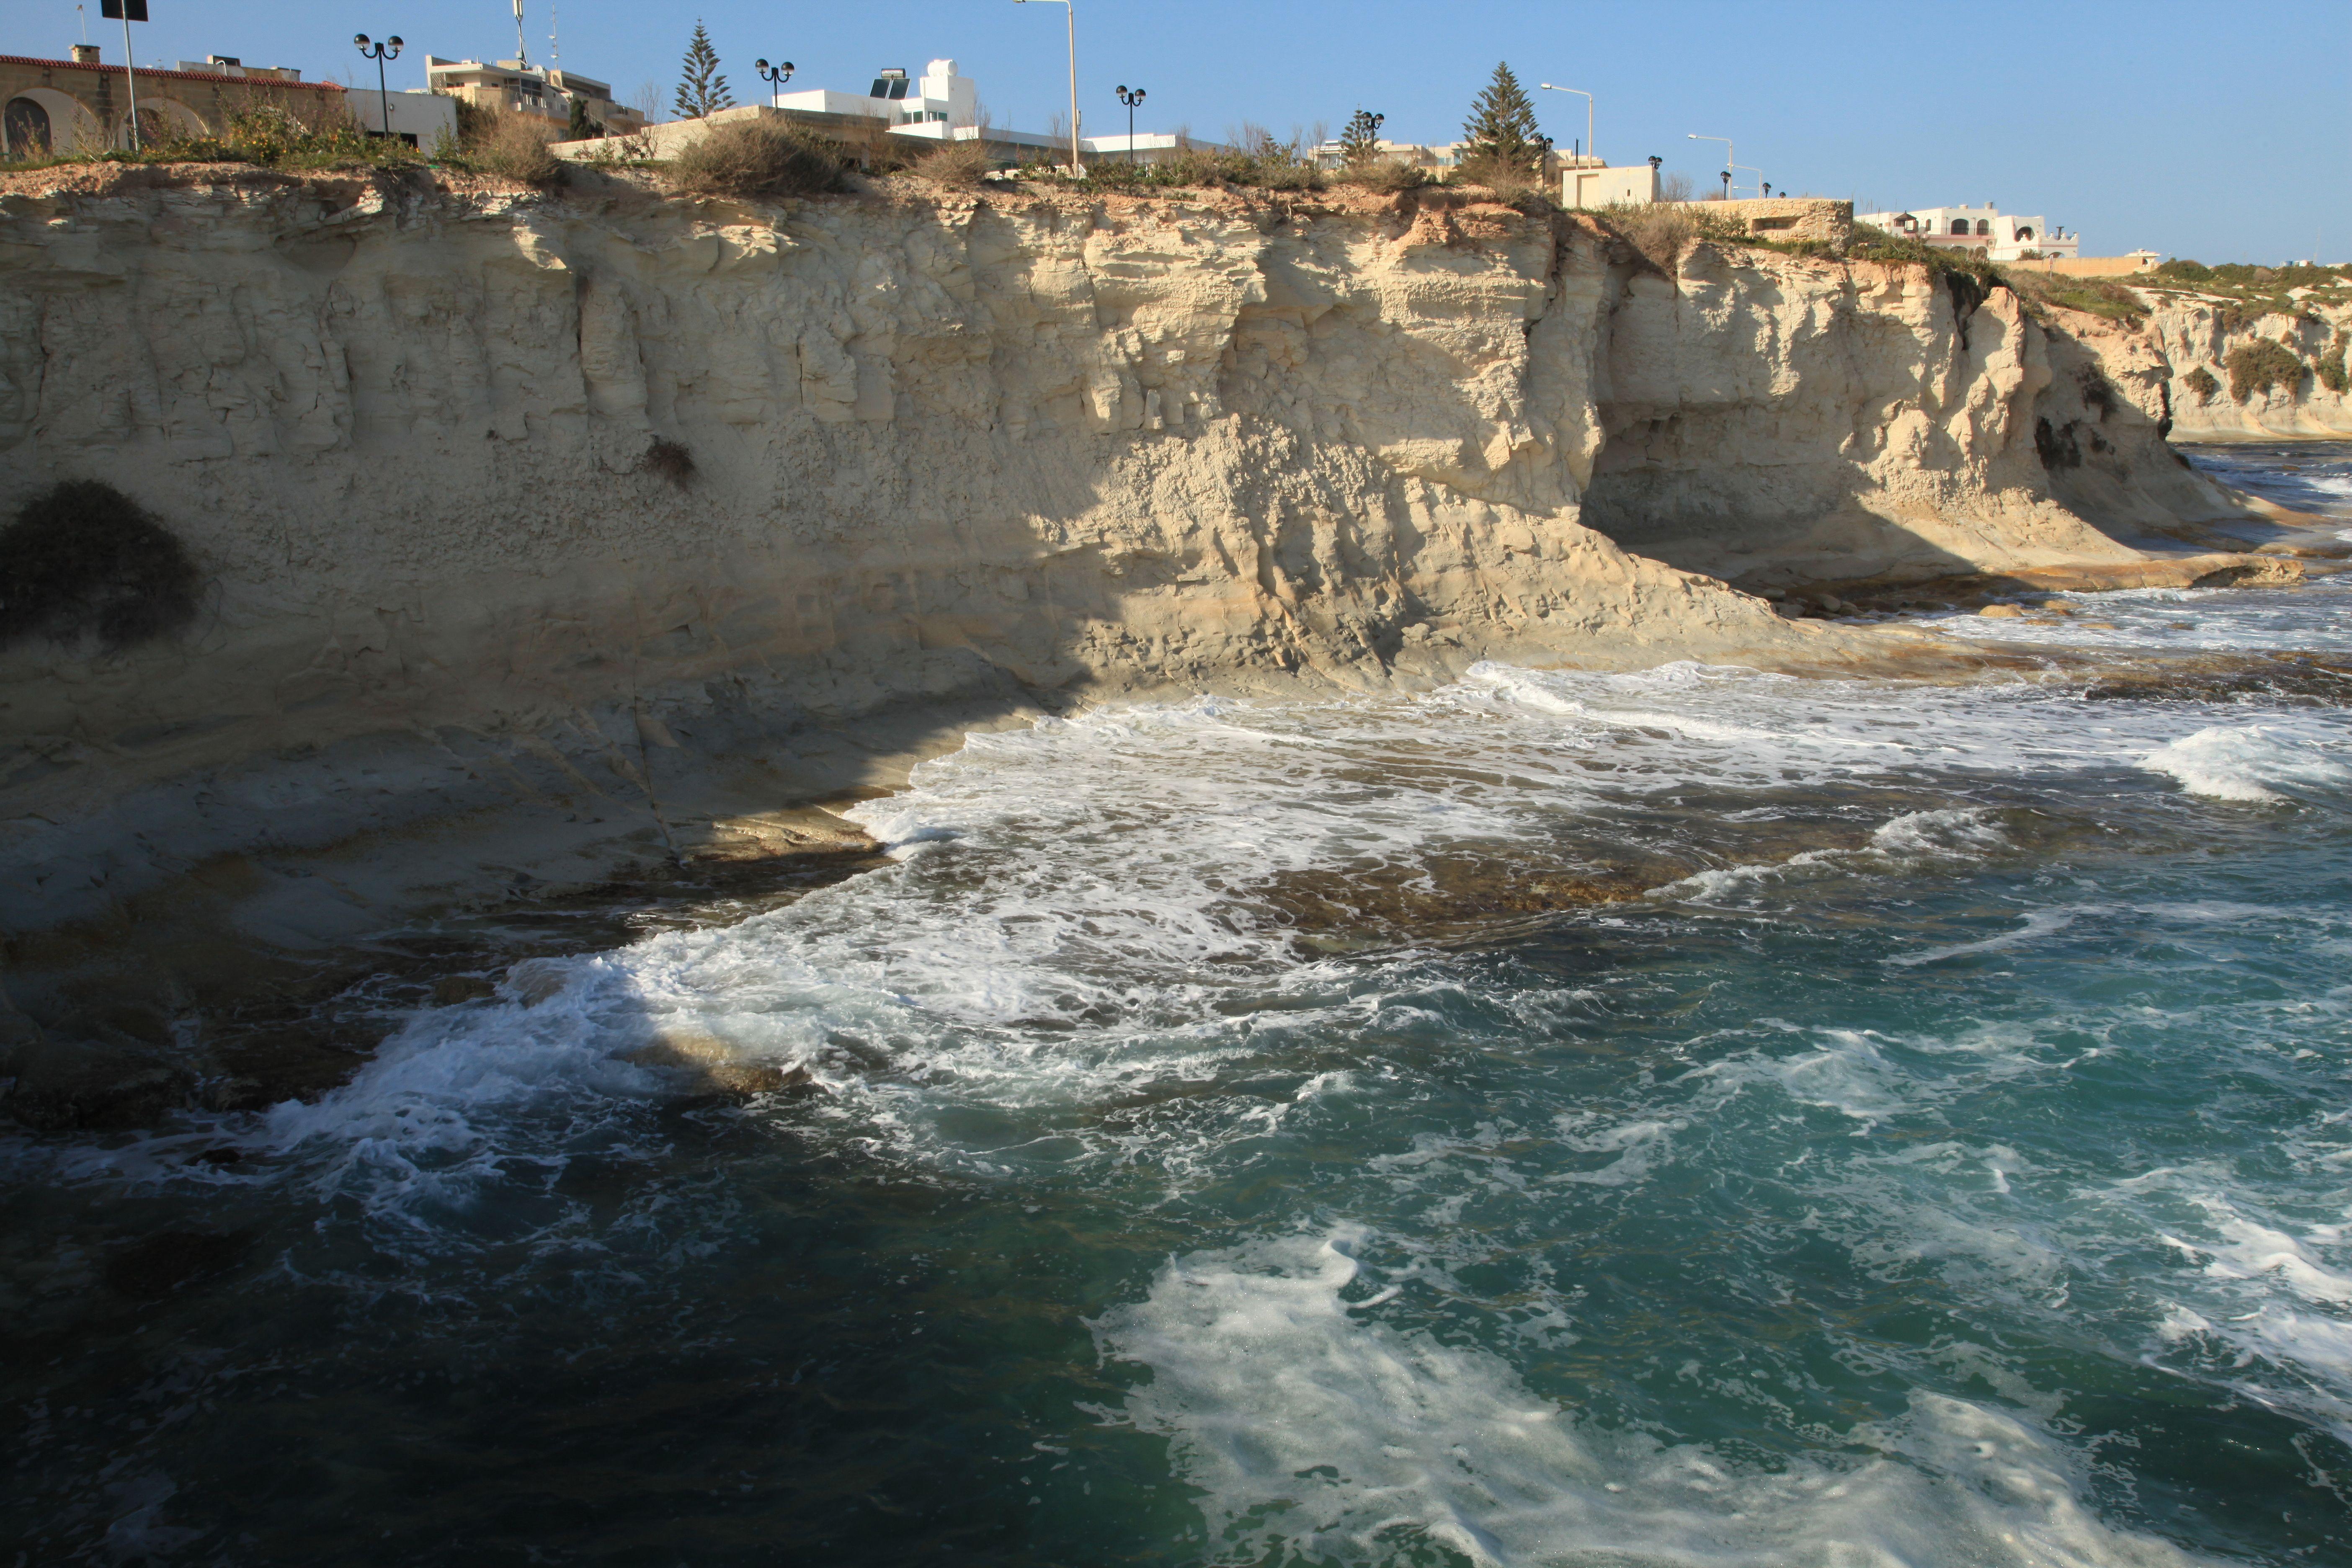 Malta_-_Marsaskala_-_St._Thomas_Bay_(Gnien_il-Bajja_ta'_San_Tumas)_08_ies.jpg 5.616×3.744 Pixel